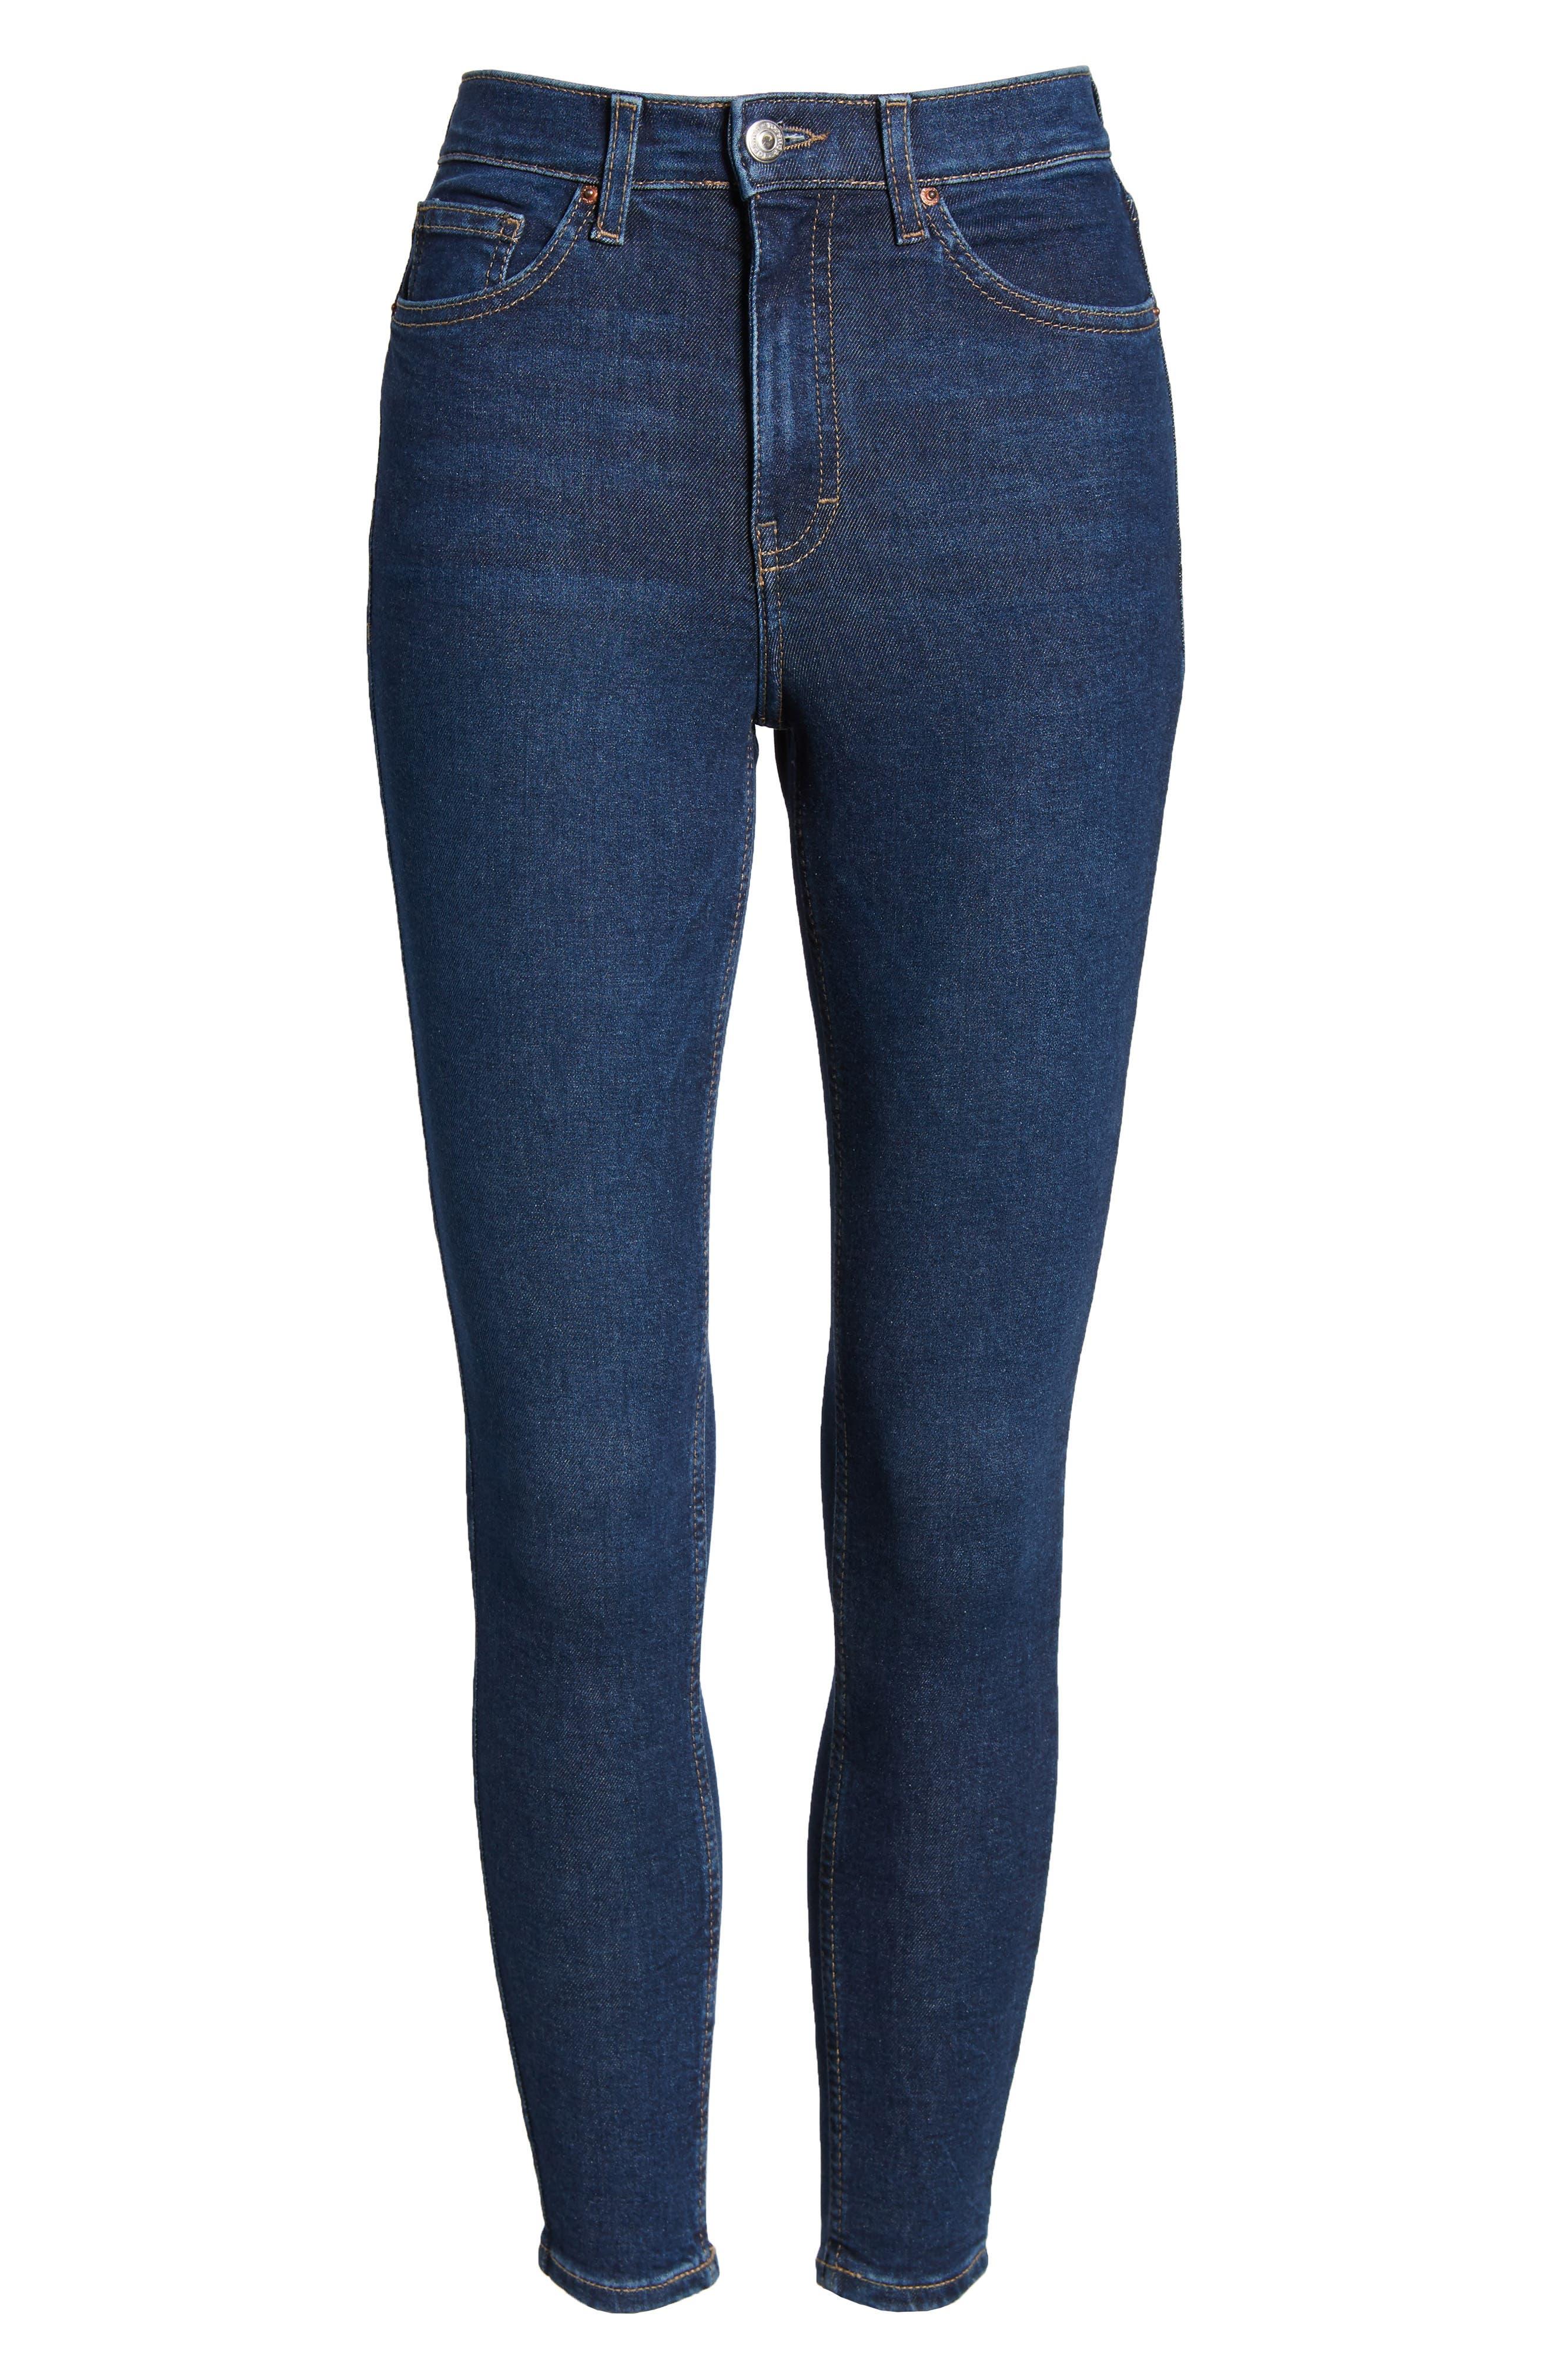 TOPSHOP, MOTO Jamie High Waist Skinny Jeans, Alternate thumbnail 7, color, INDIGO